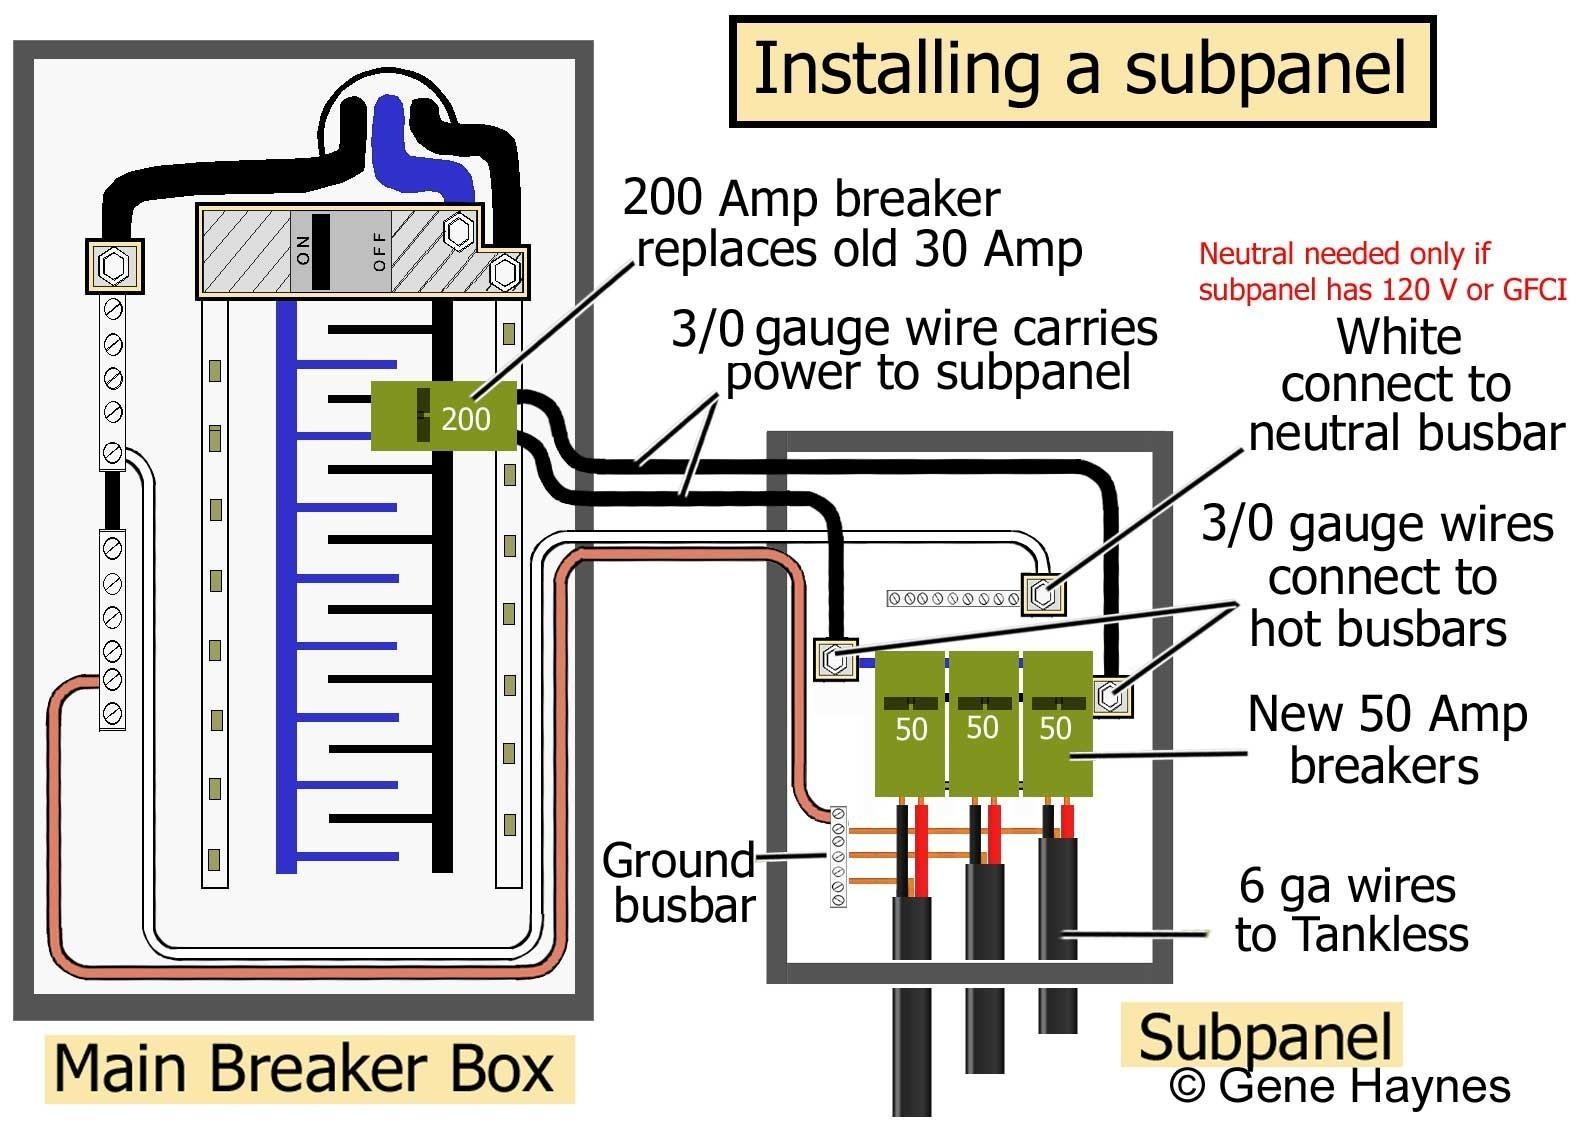 Electrical Sub Panel Wiring Diagram 125 Amp Main Breaker Panel Wiring Diagram Example Electrical Circuit